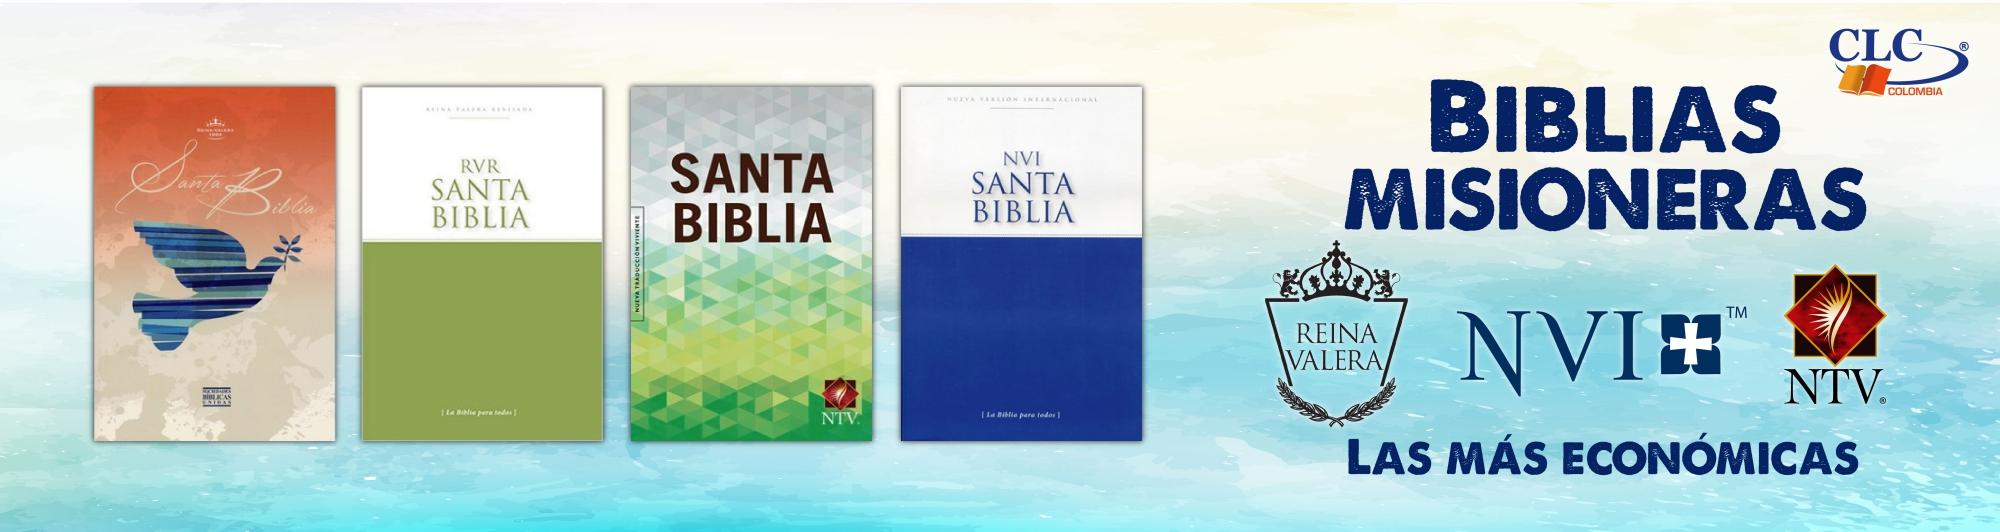 banner biblias misioneras-03 (1)